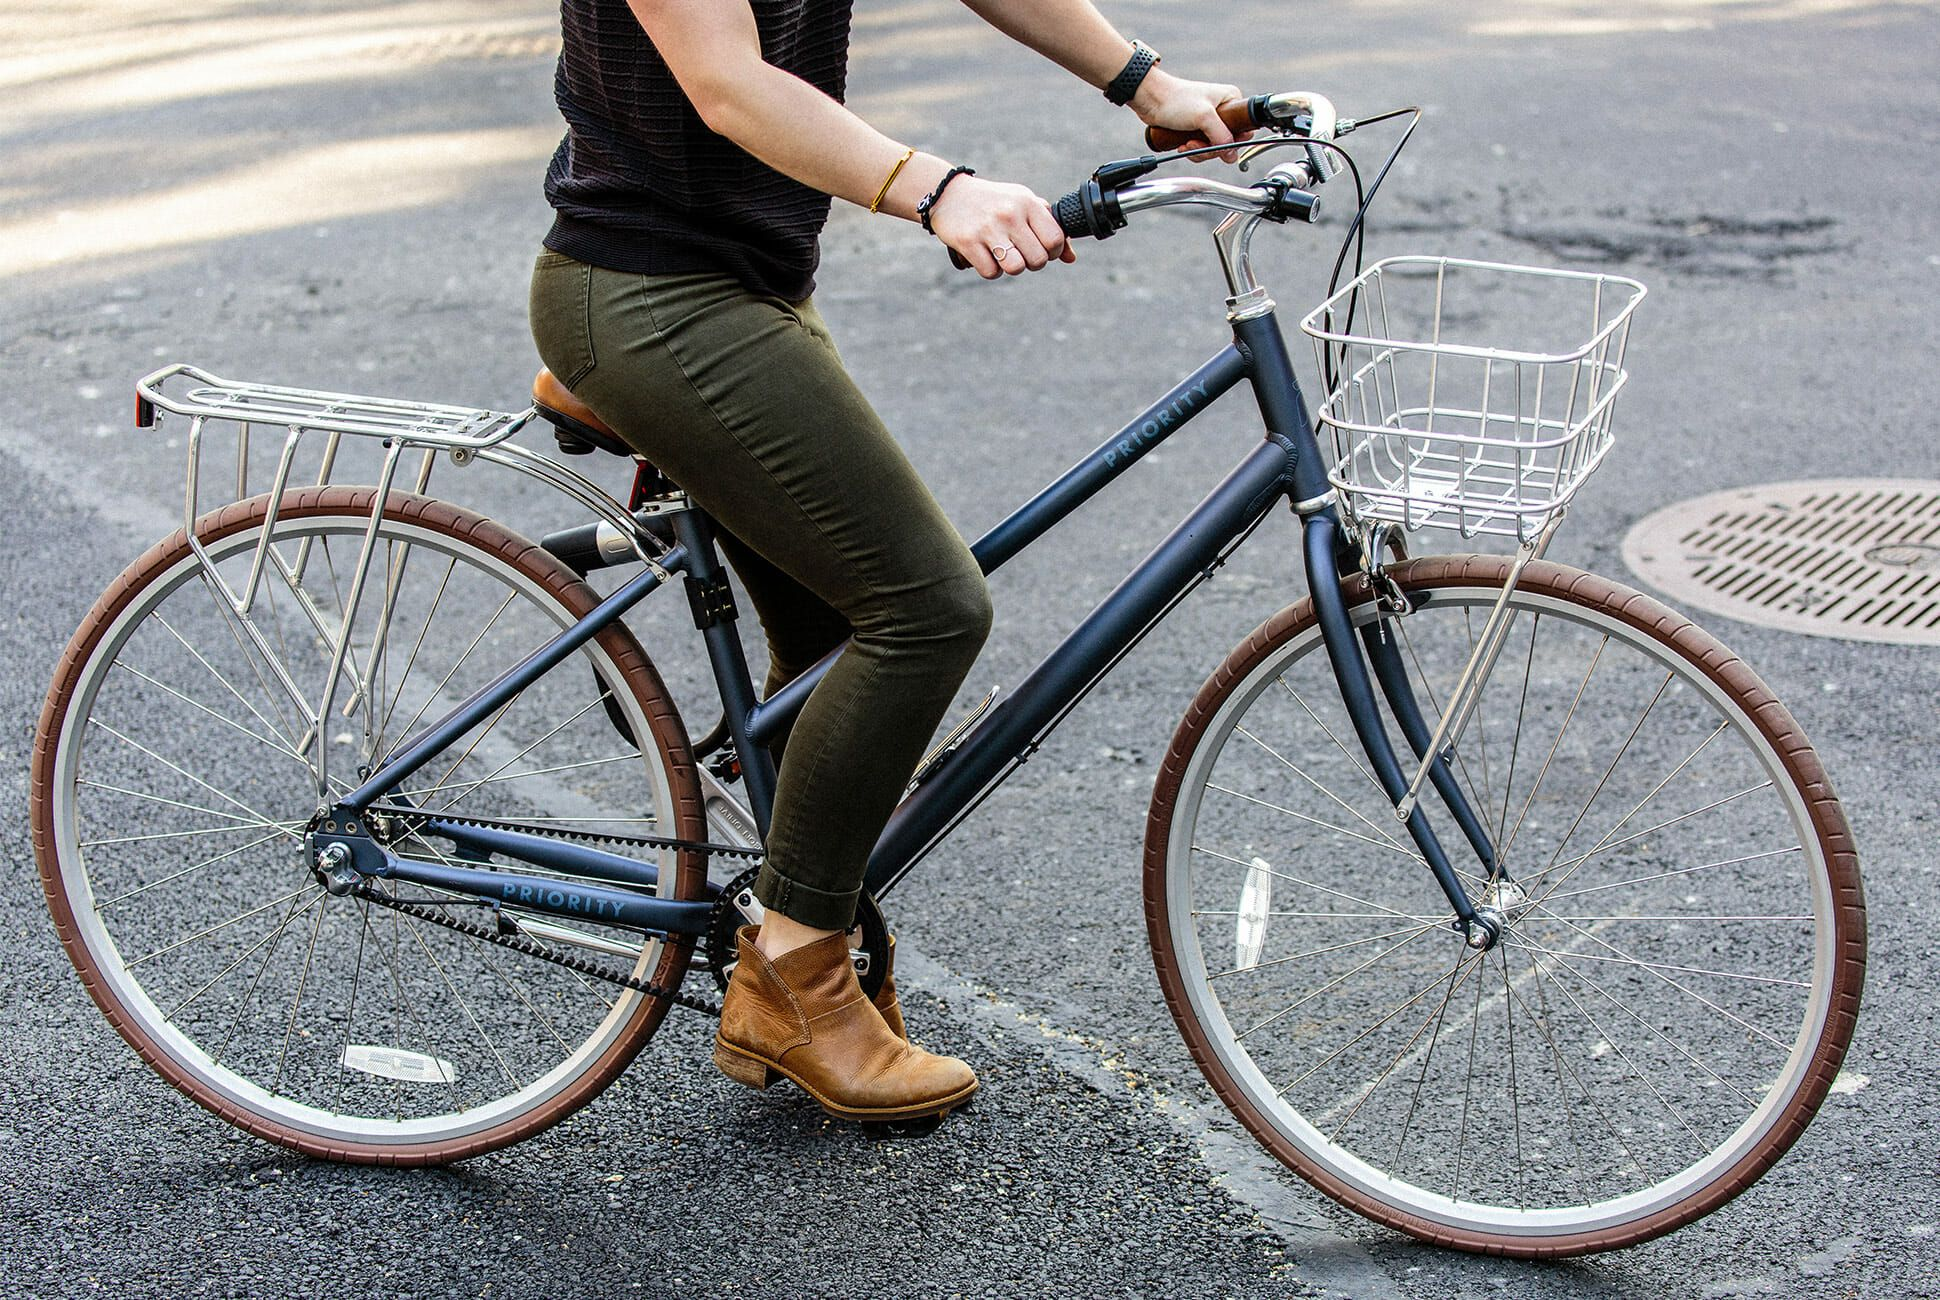 Priority-No-Maintenance-Bike-gear-patrol-slide-9